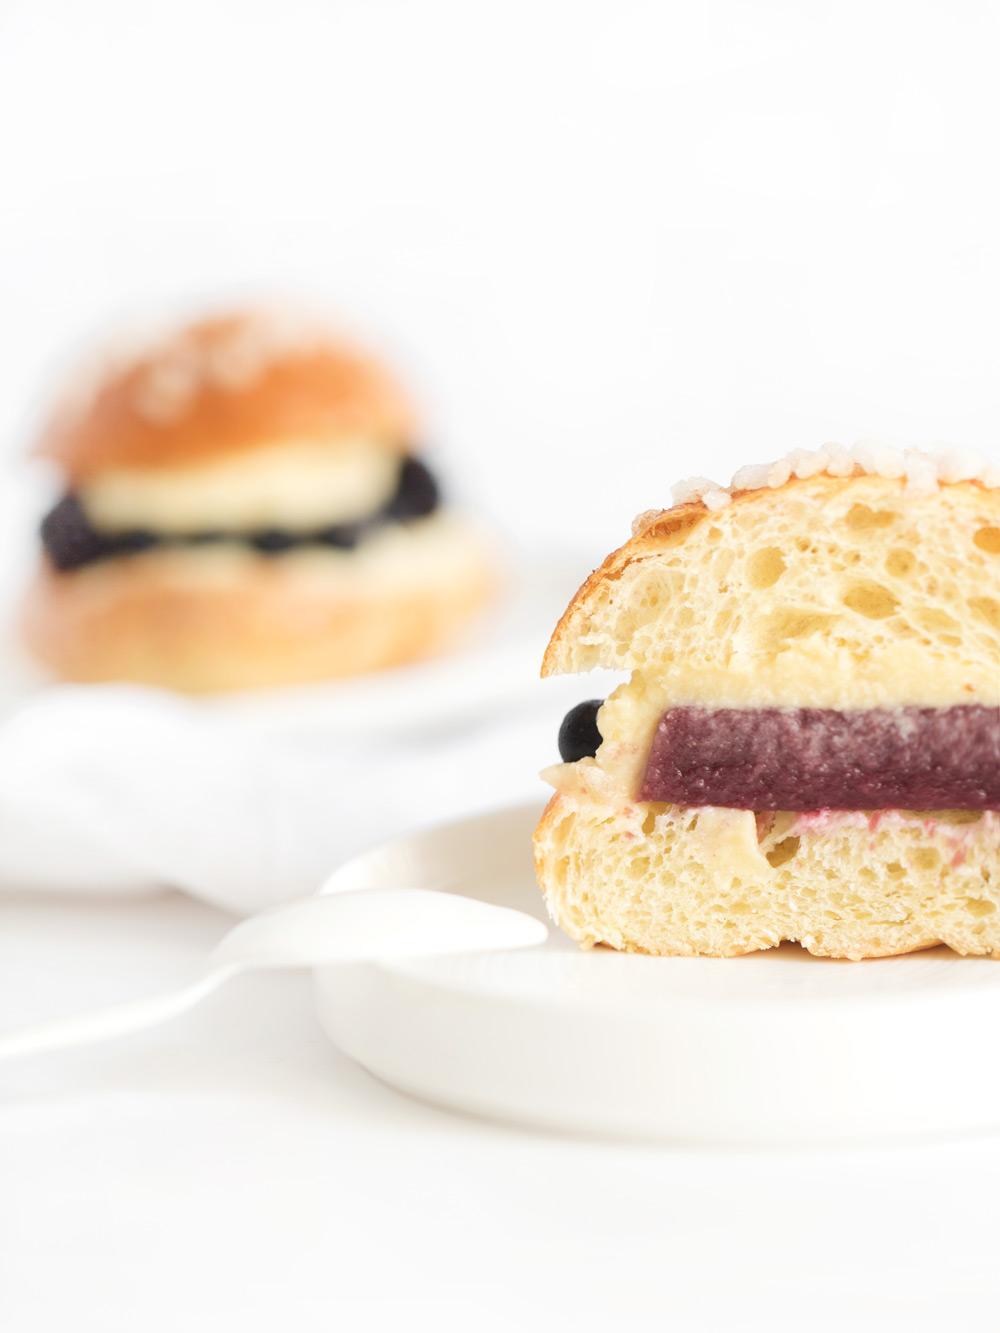 Blanccoco_Recette_Burgers_Dessert_Myrtilles_Mures_2